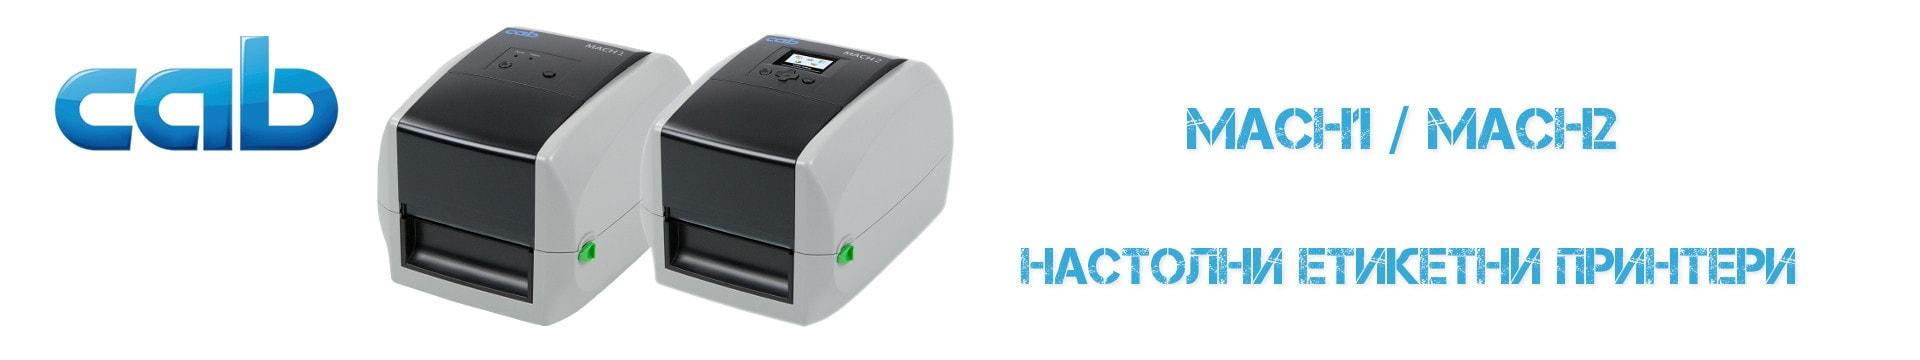 Етикетни принтери CAB MACH1/MACH2